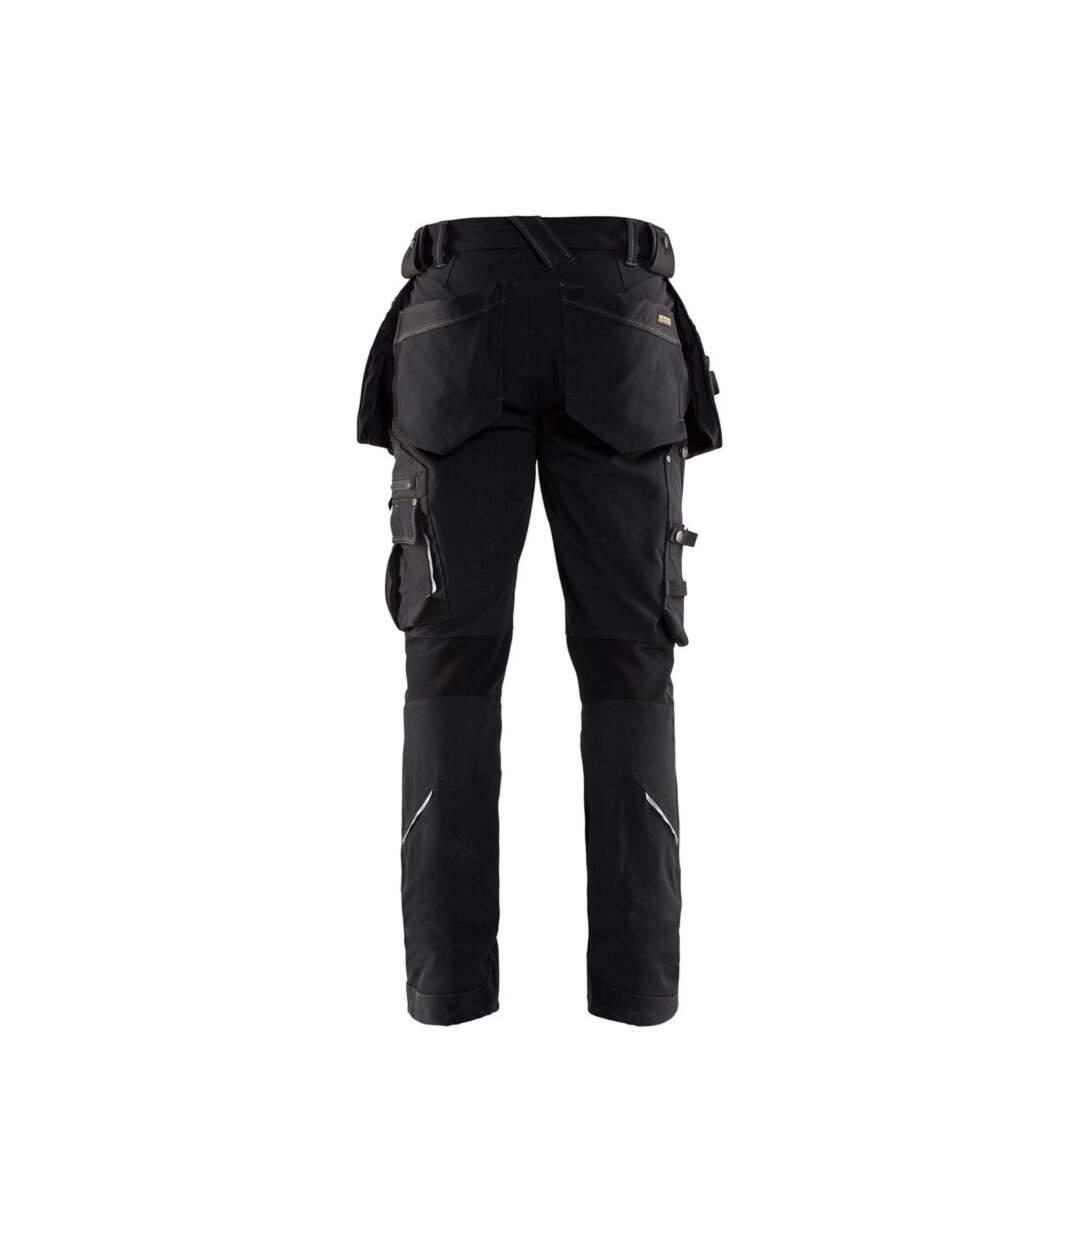 Pantalon   X1900 Blaklader STRETCH 4D